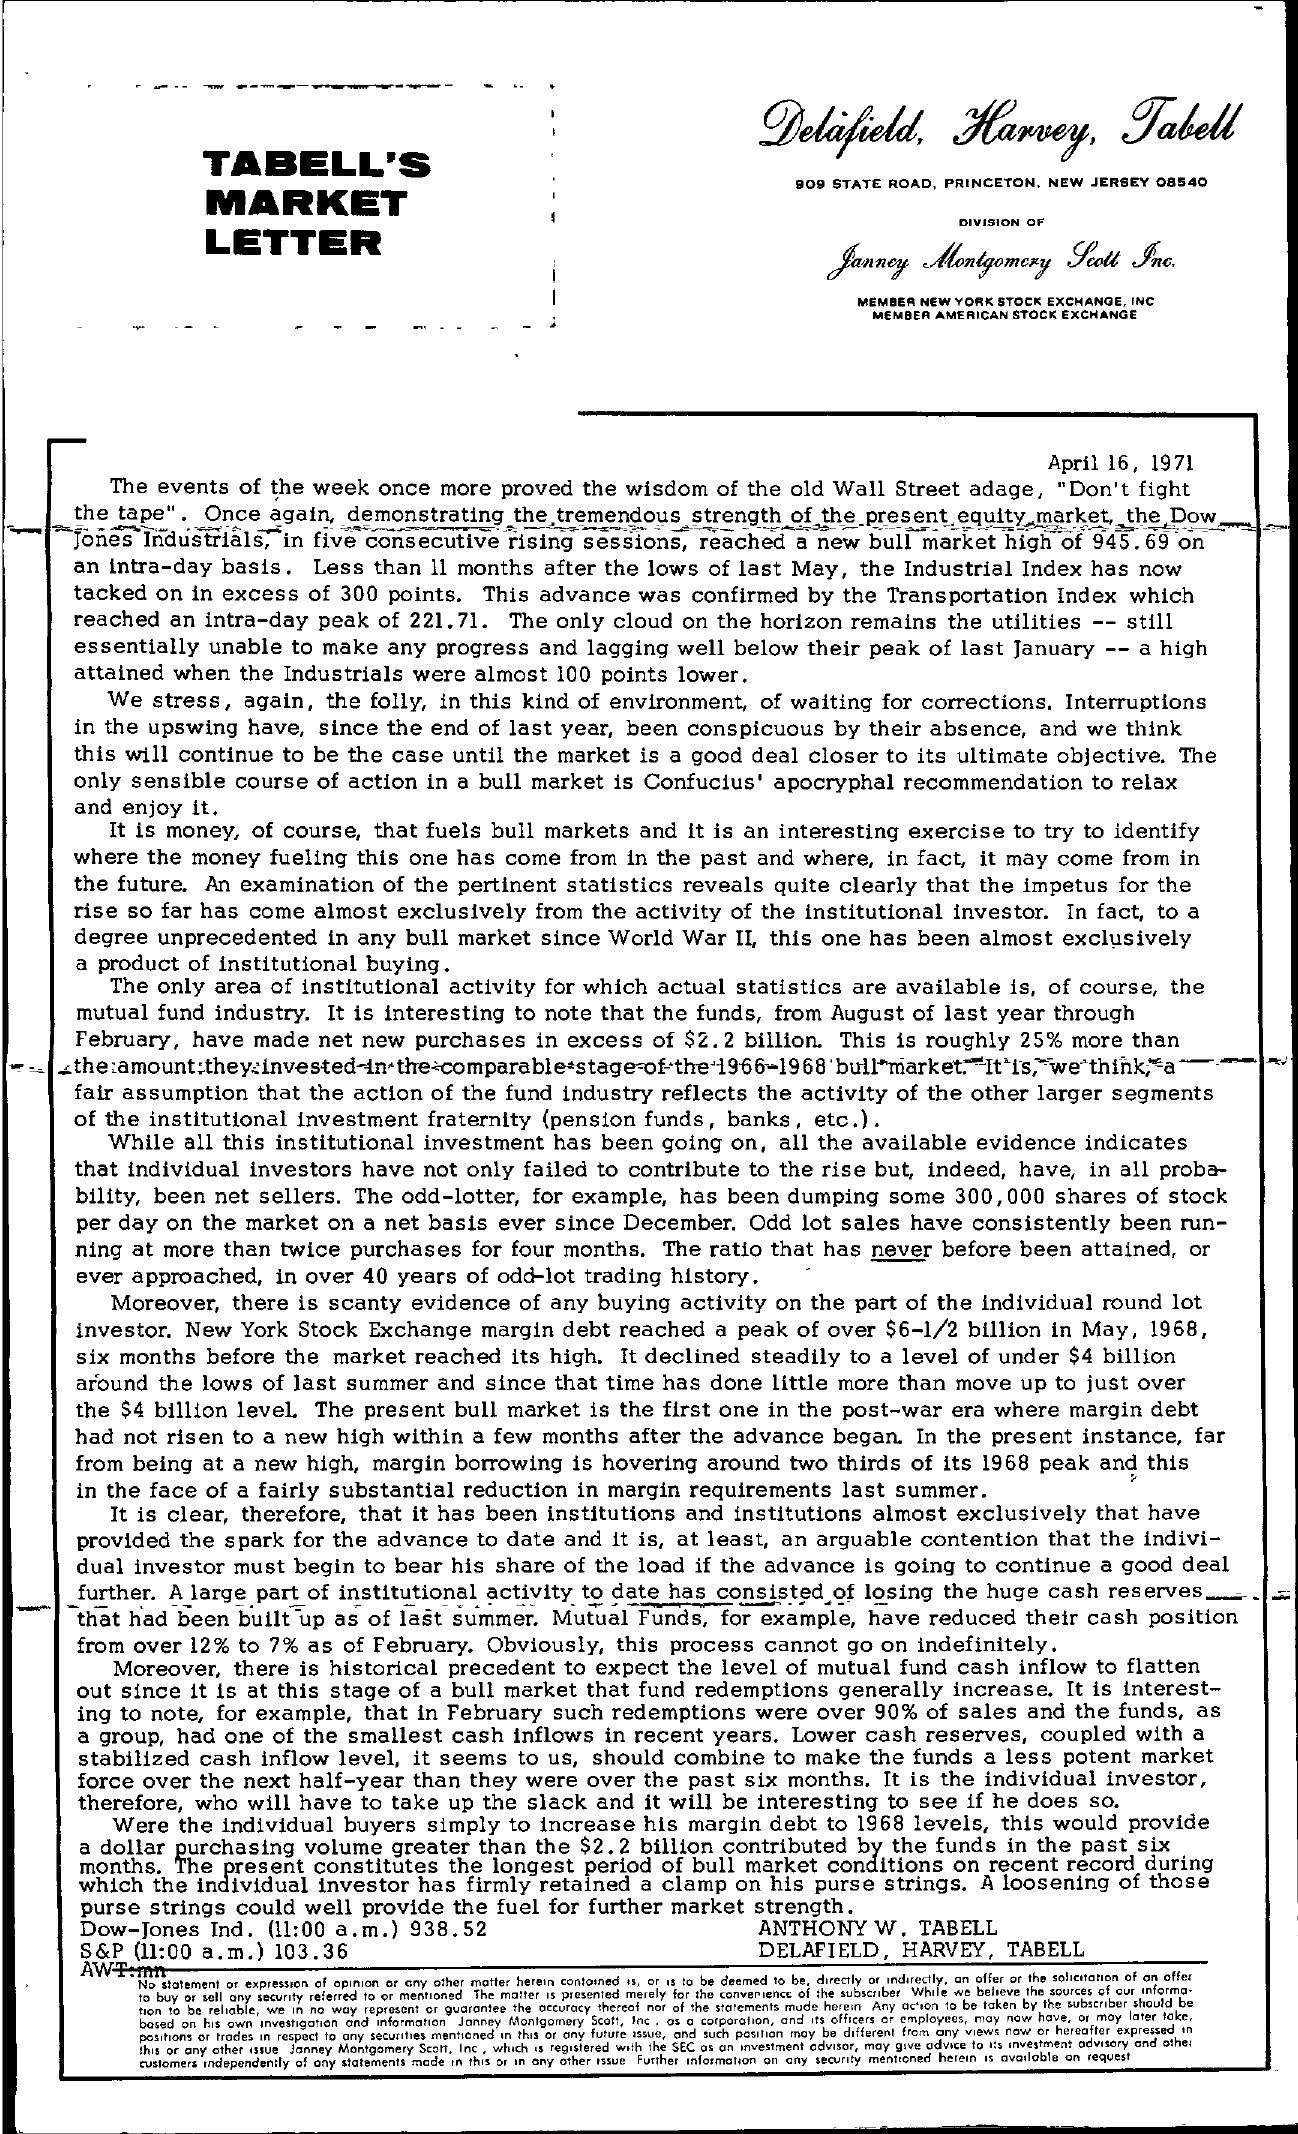 Tabell's Market Letter - April 16, 1971